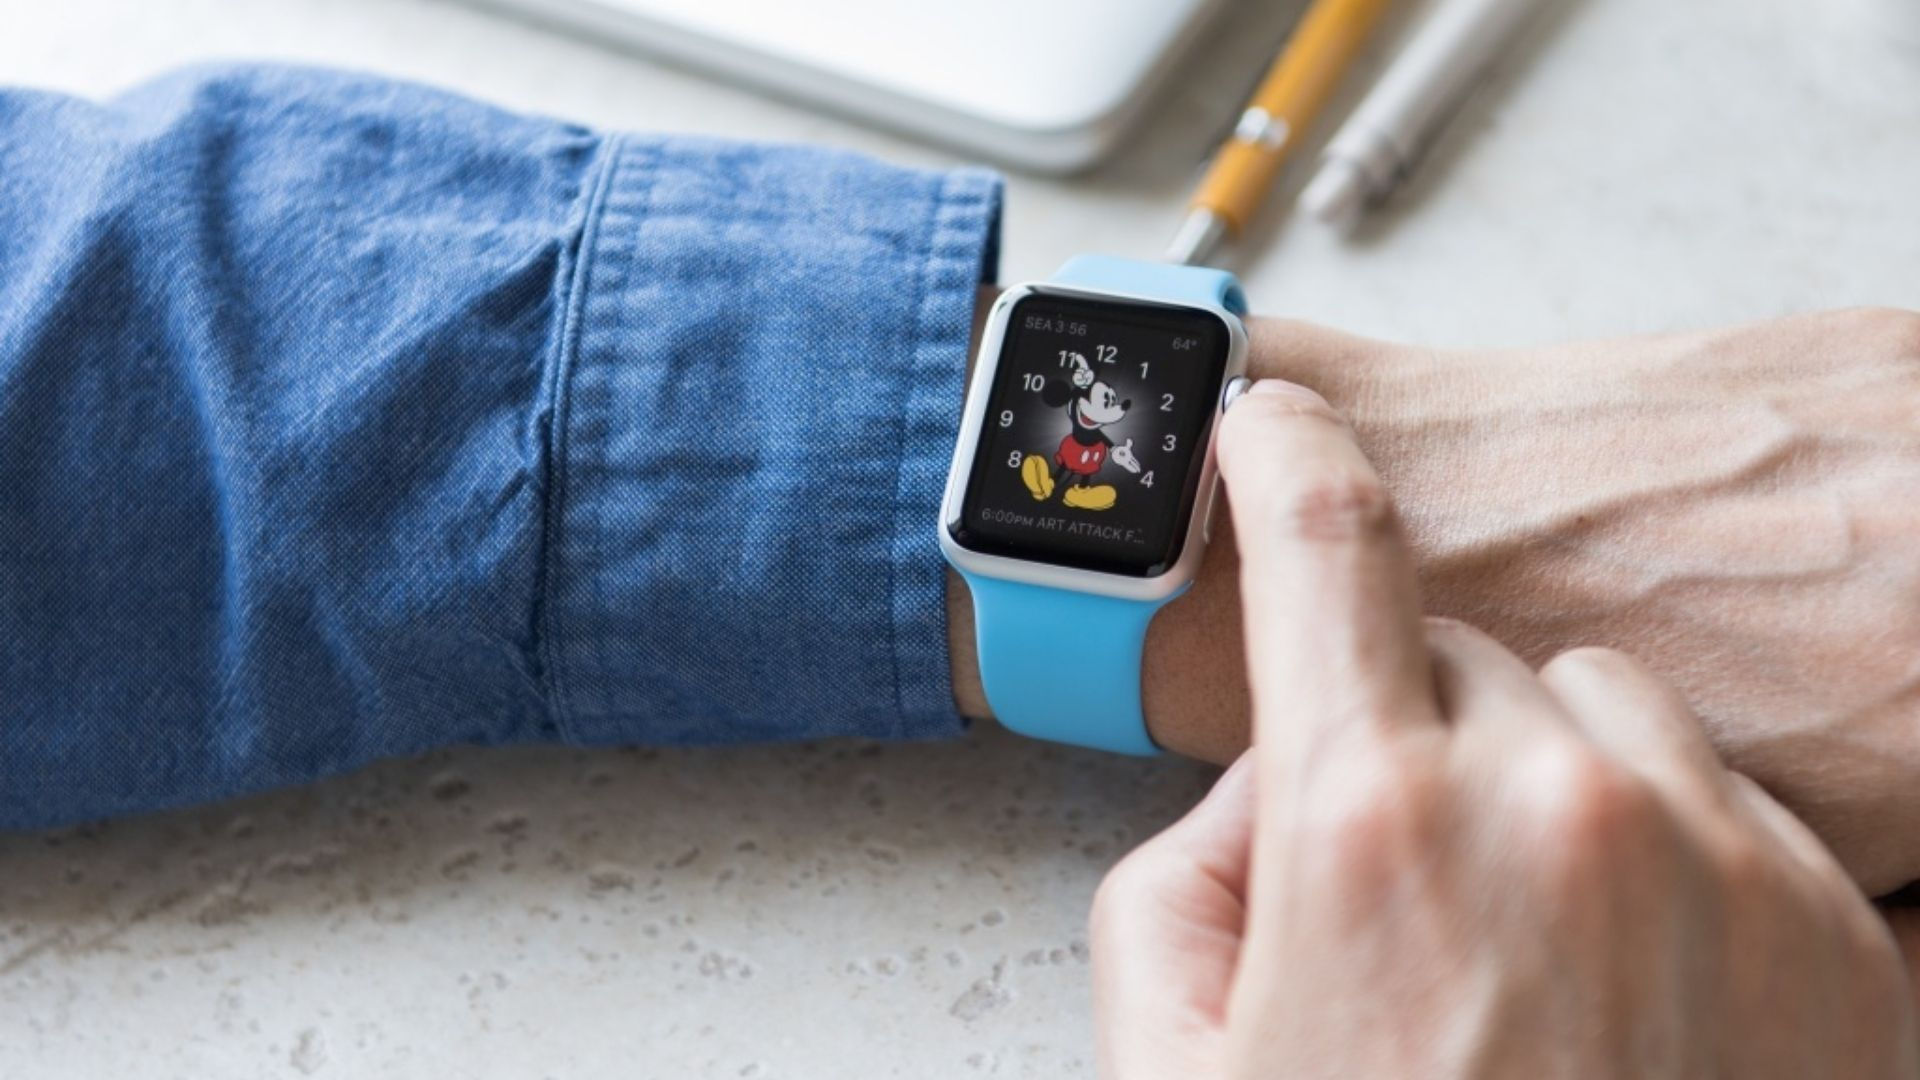 Interface do Mickey presente no Apple Watch (foto) também está disponível no smartwatch Iwo 8 (Foto: Anna Hoychuk/Shutterstock)